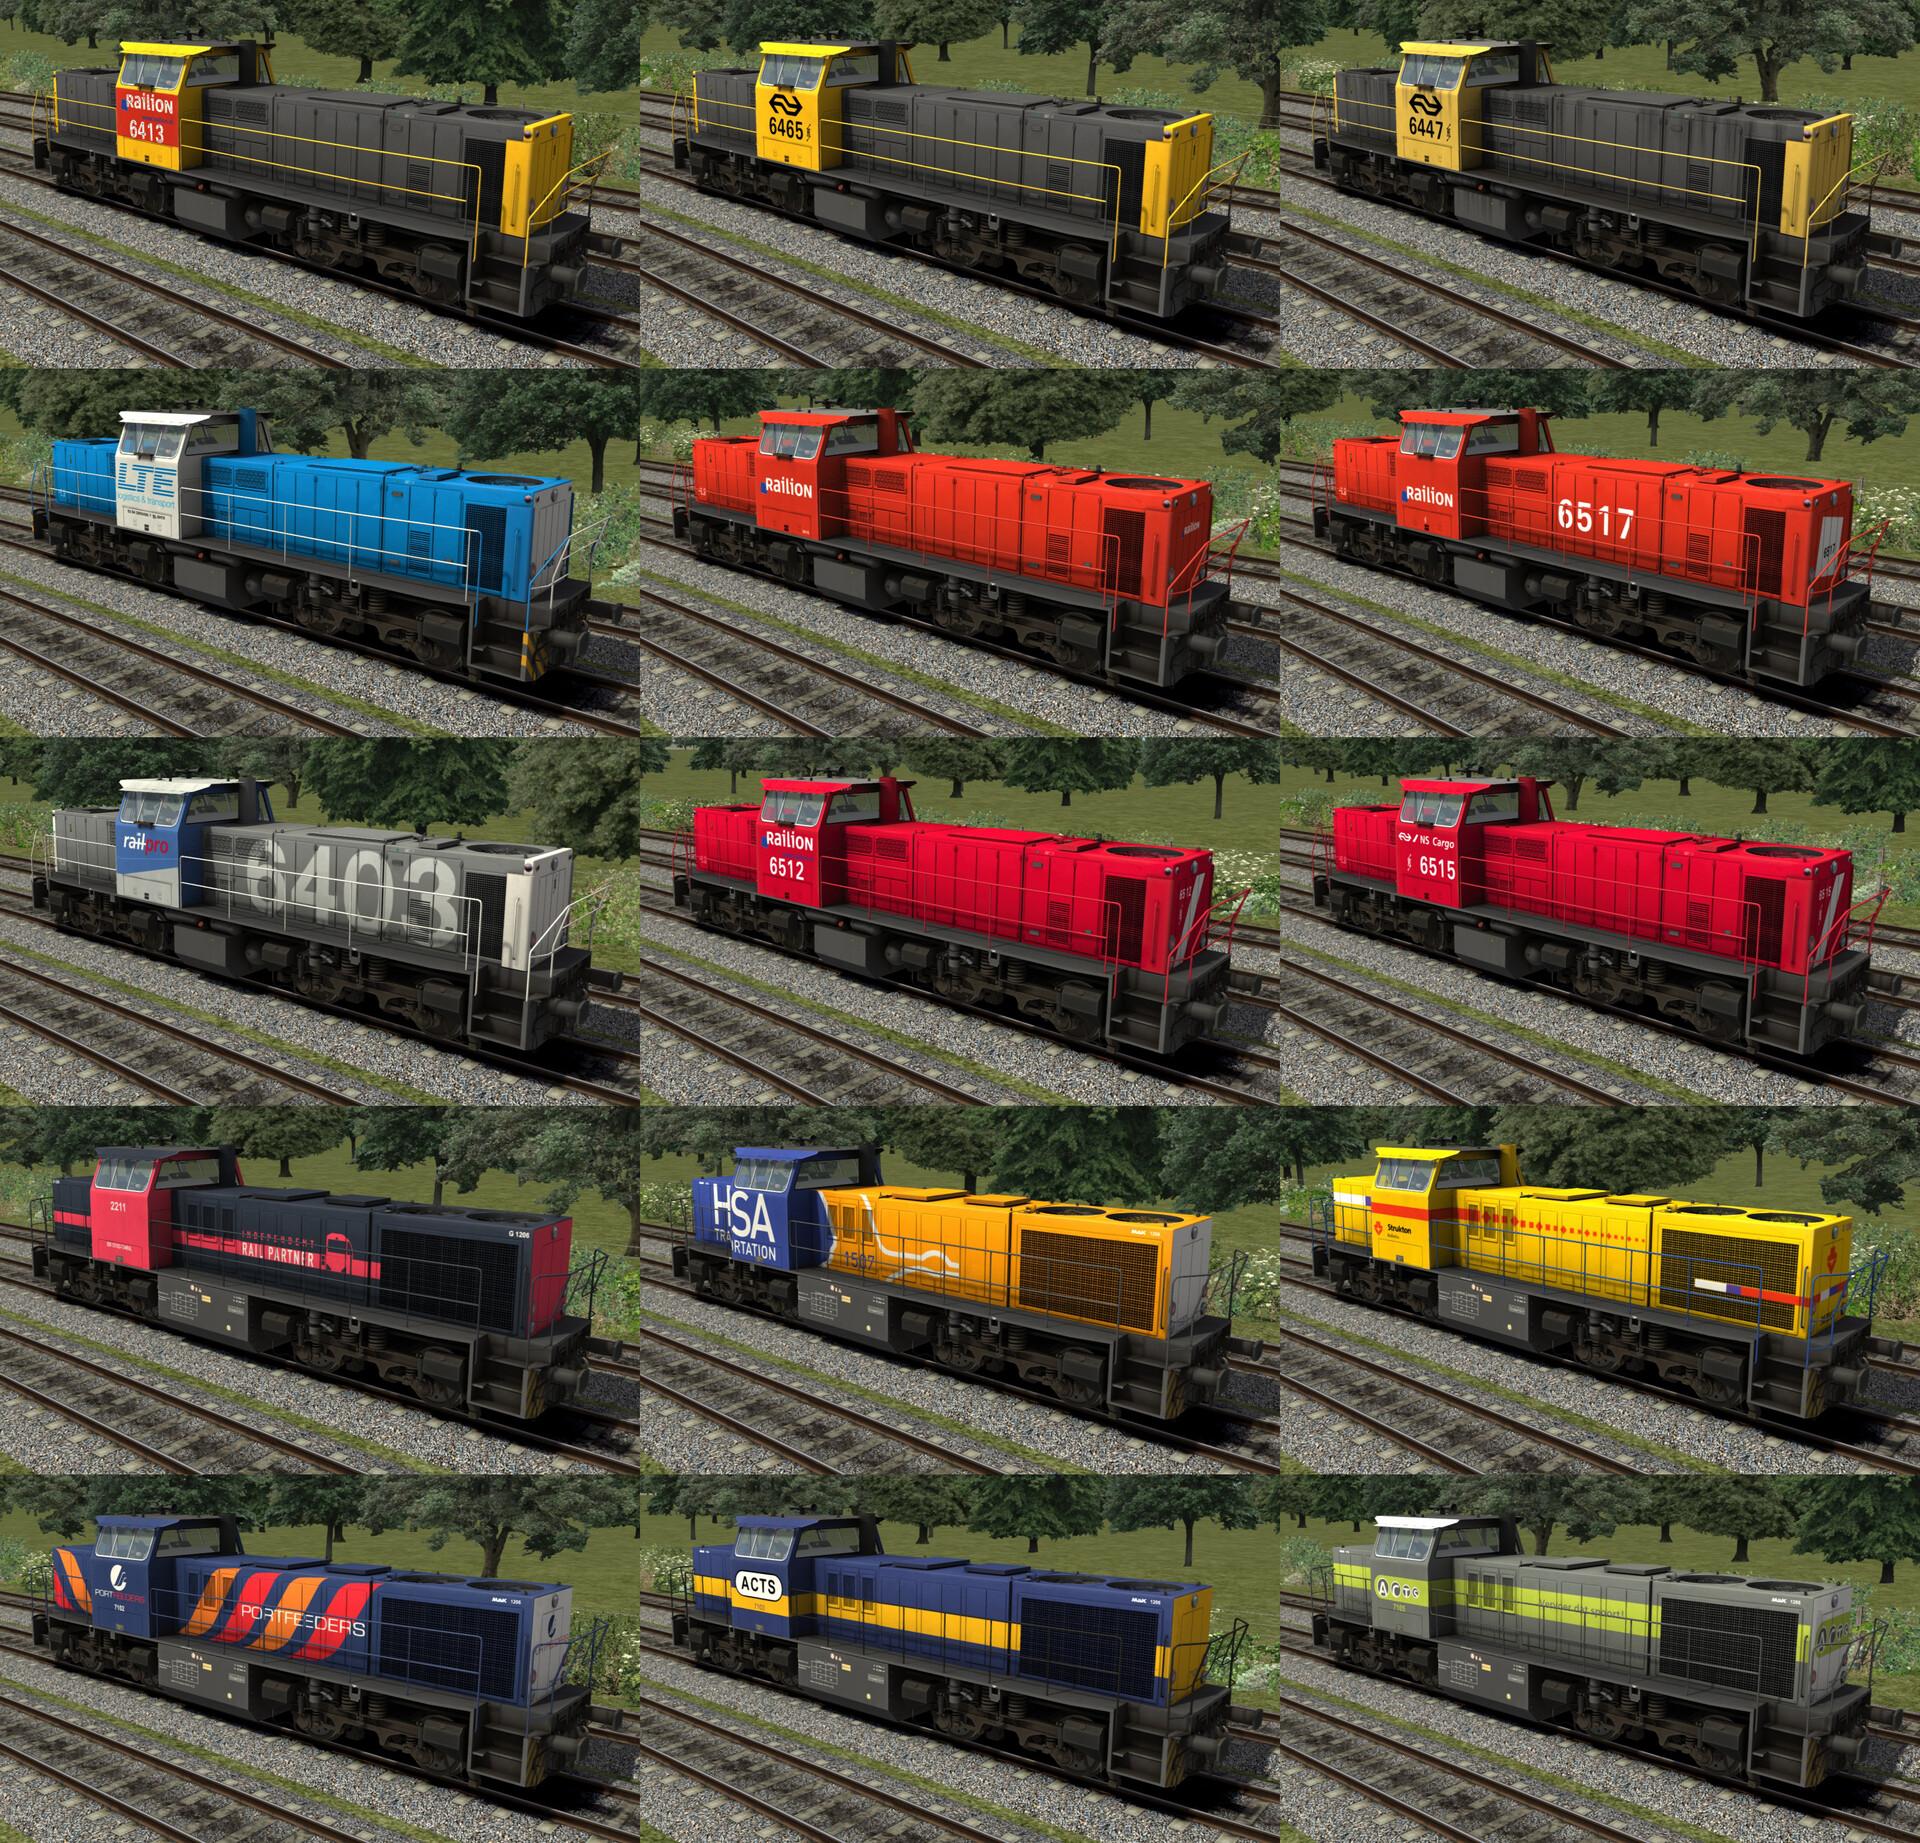 All 9 derivatives of the 6400 locomotive plus 6 MaK g1206 derivatives.